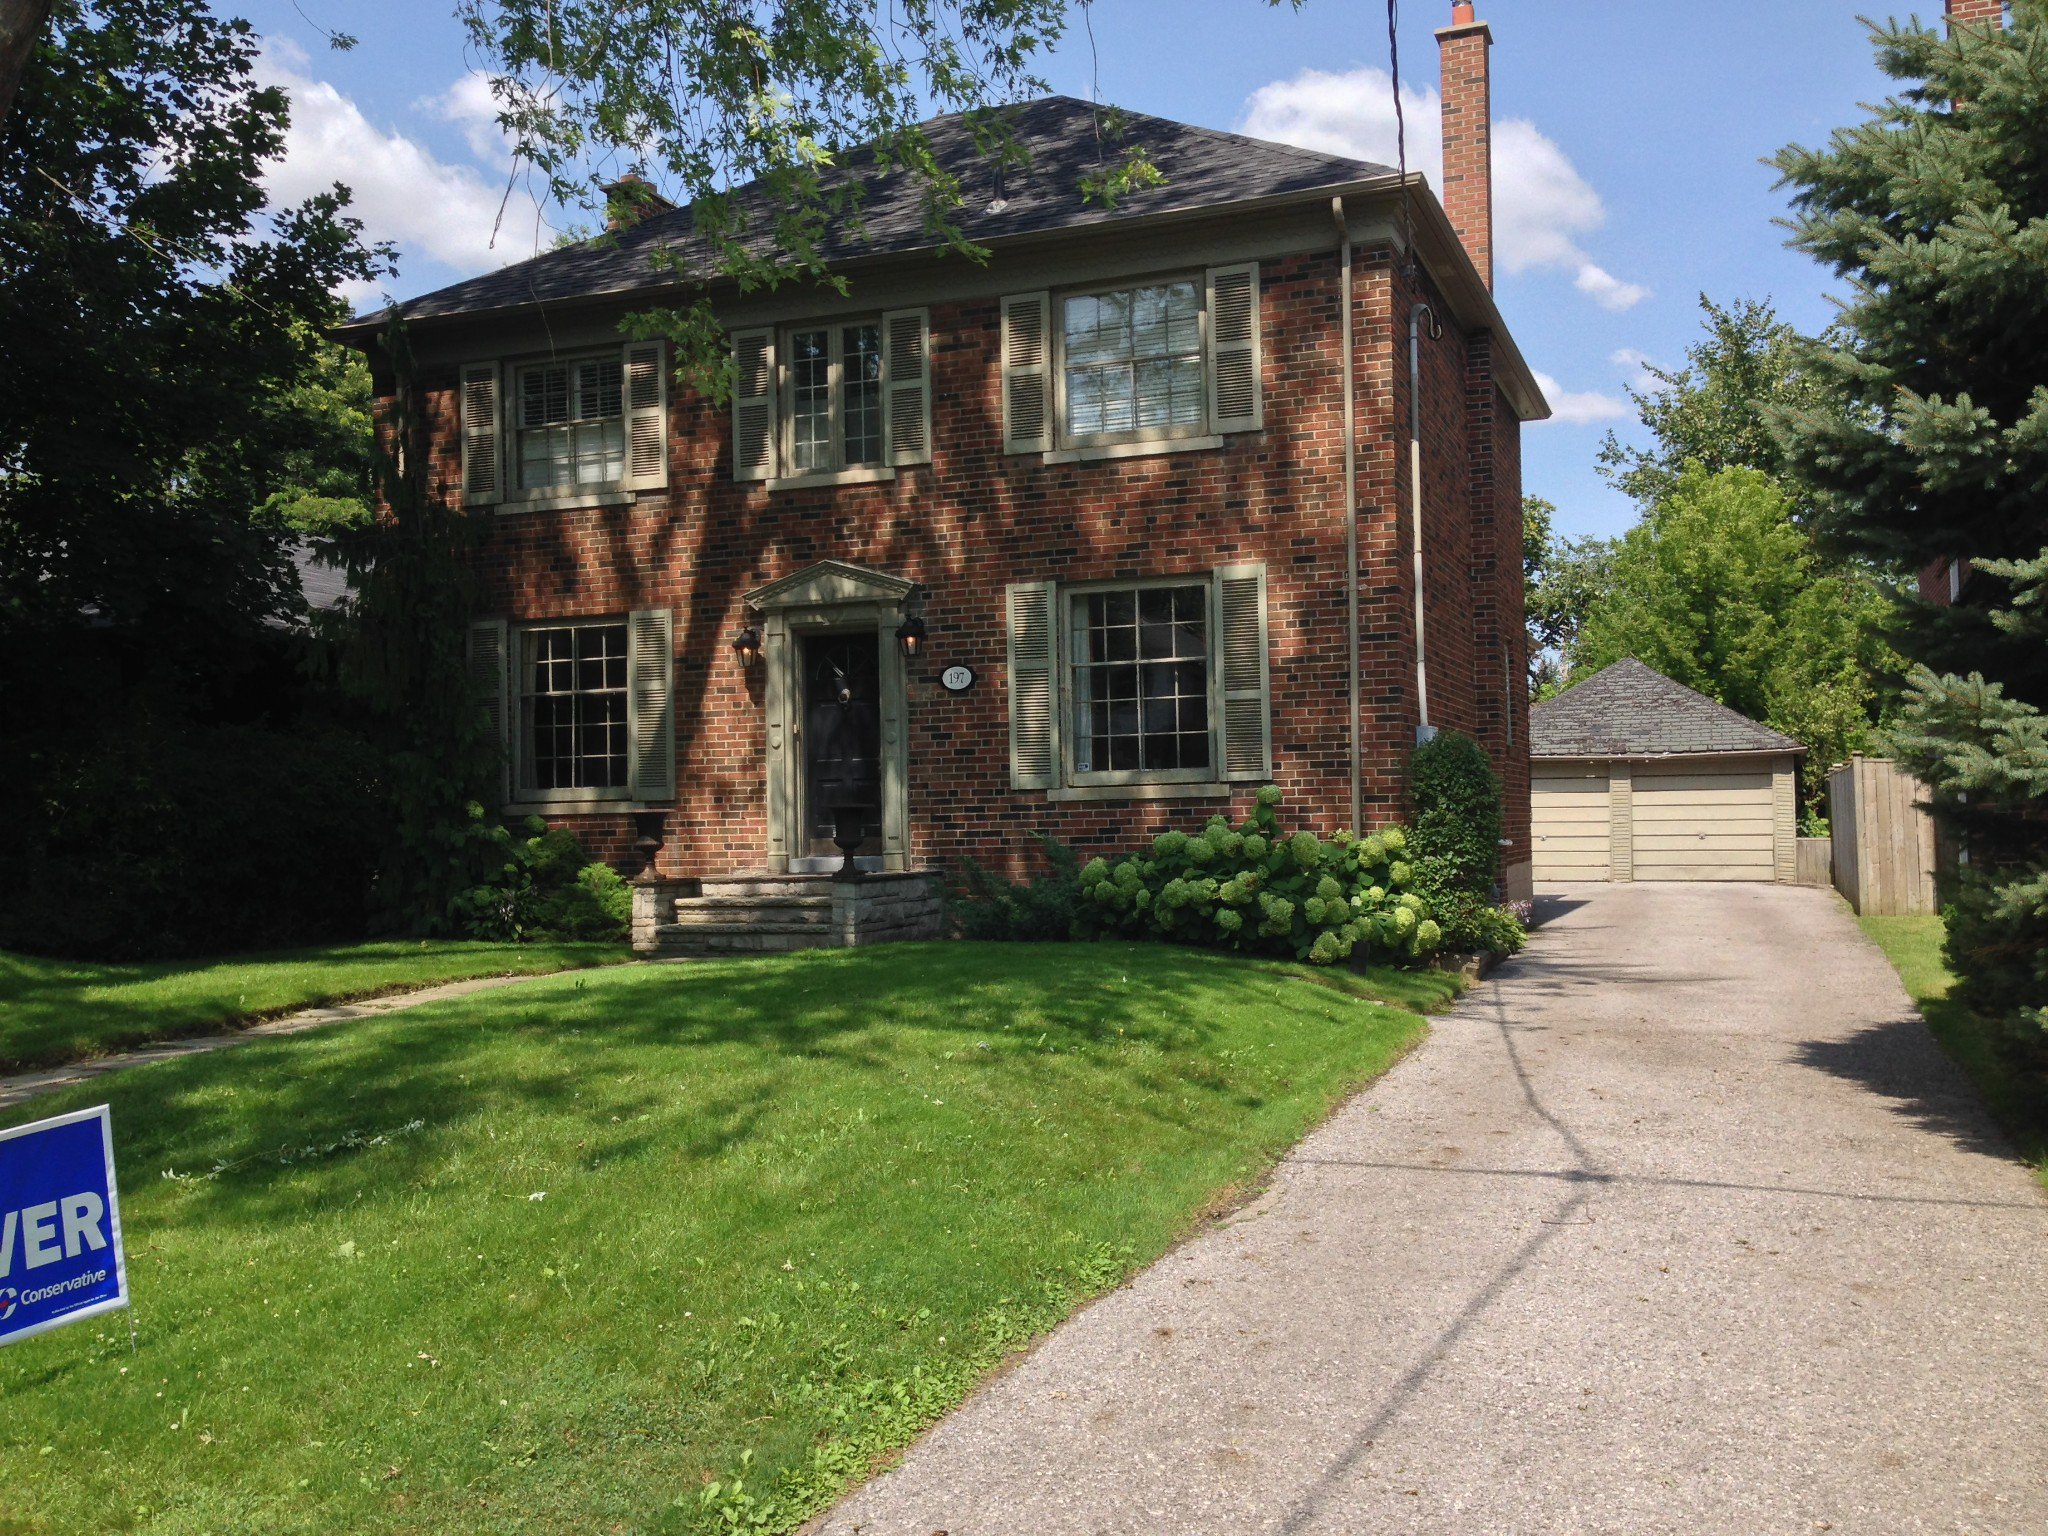 Main Photo: 197 Coldstream Avenue in Toronto: Lytton Park Freehold for sale (Toronto C04)